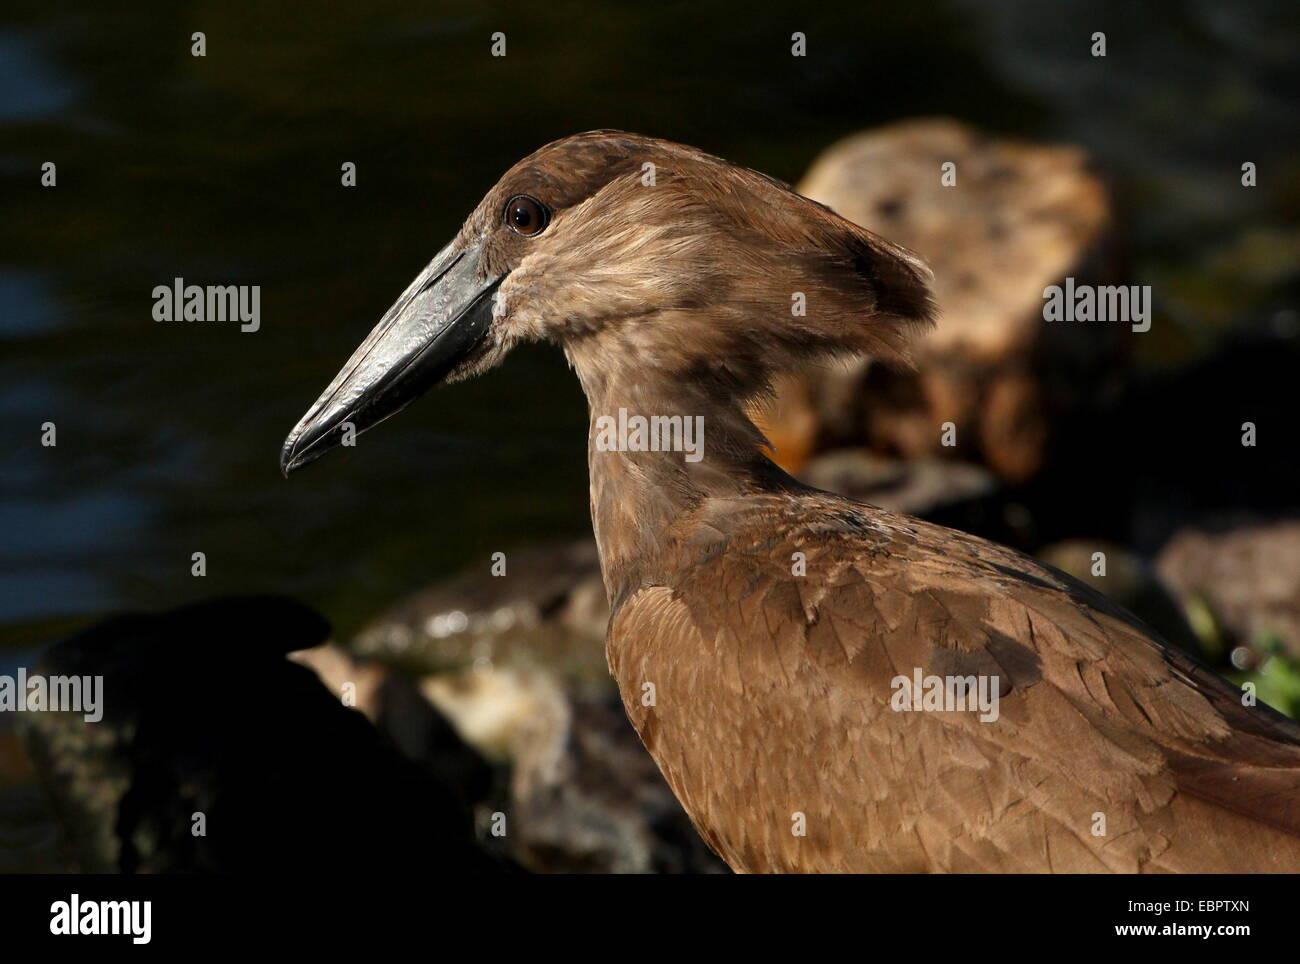 Close-up of the anvil-shaped head of a Hamerkop or Hammerhead stork (Scopus umbretta) Stock Photo